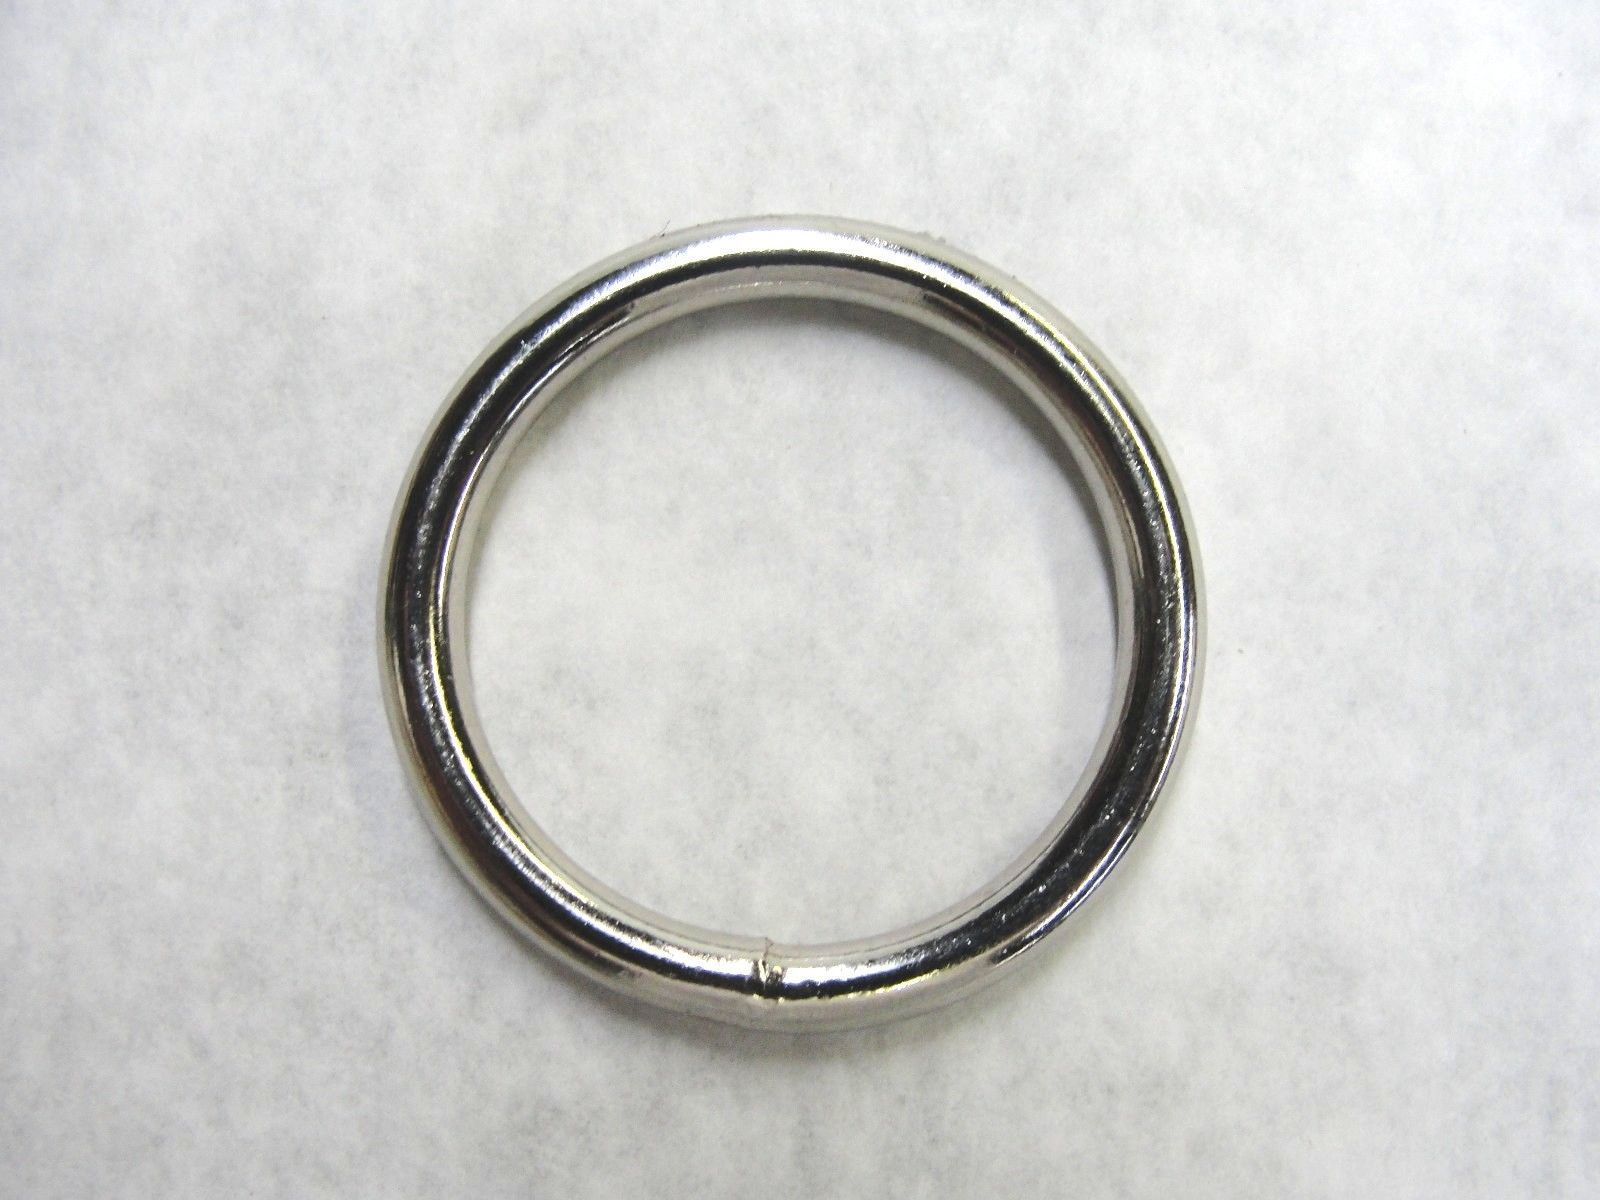 25mm//1inch Internal Diameter Heavy Metal Ring Four Welded